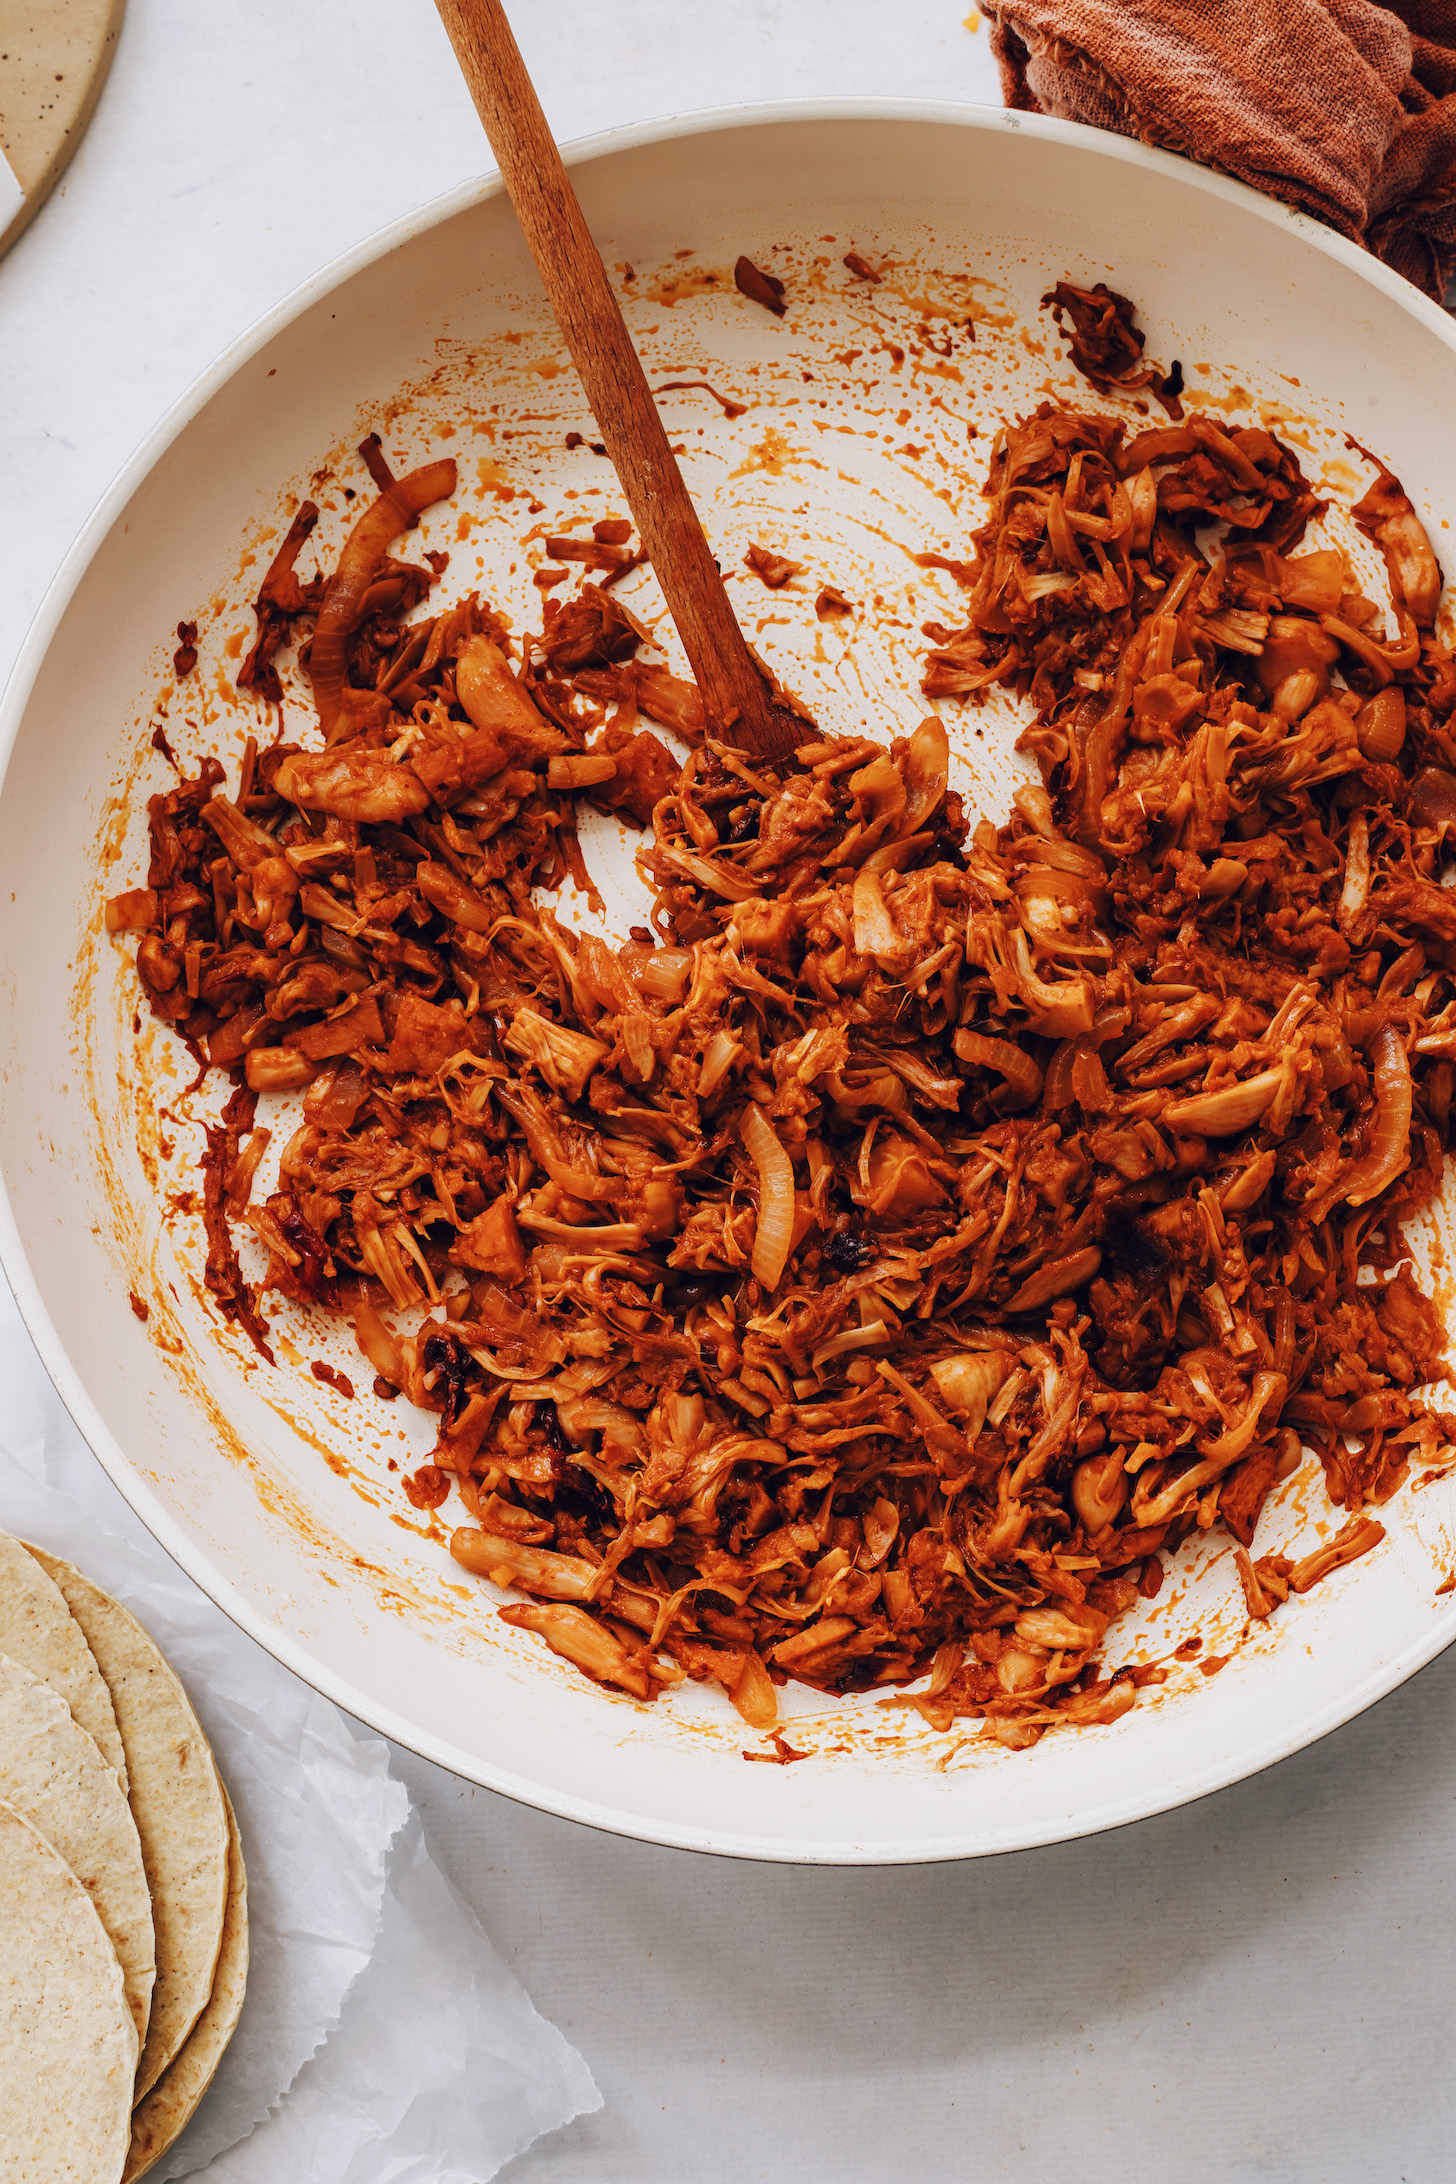 Pan of spicy shredded jackfruit